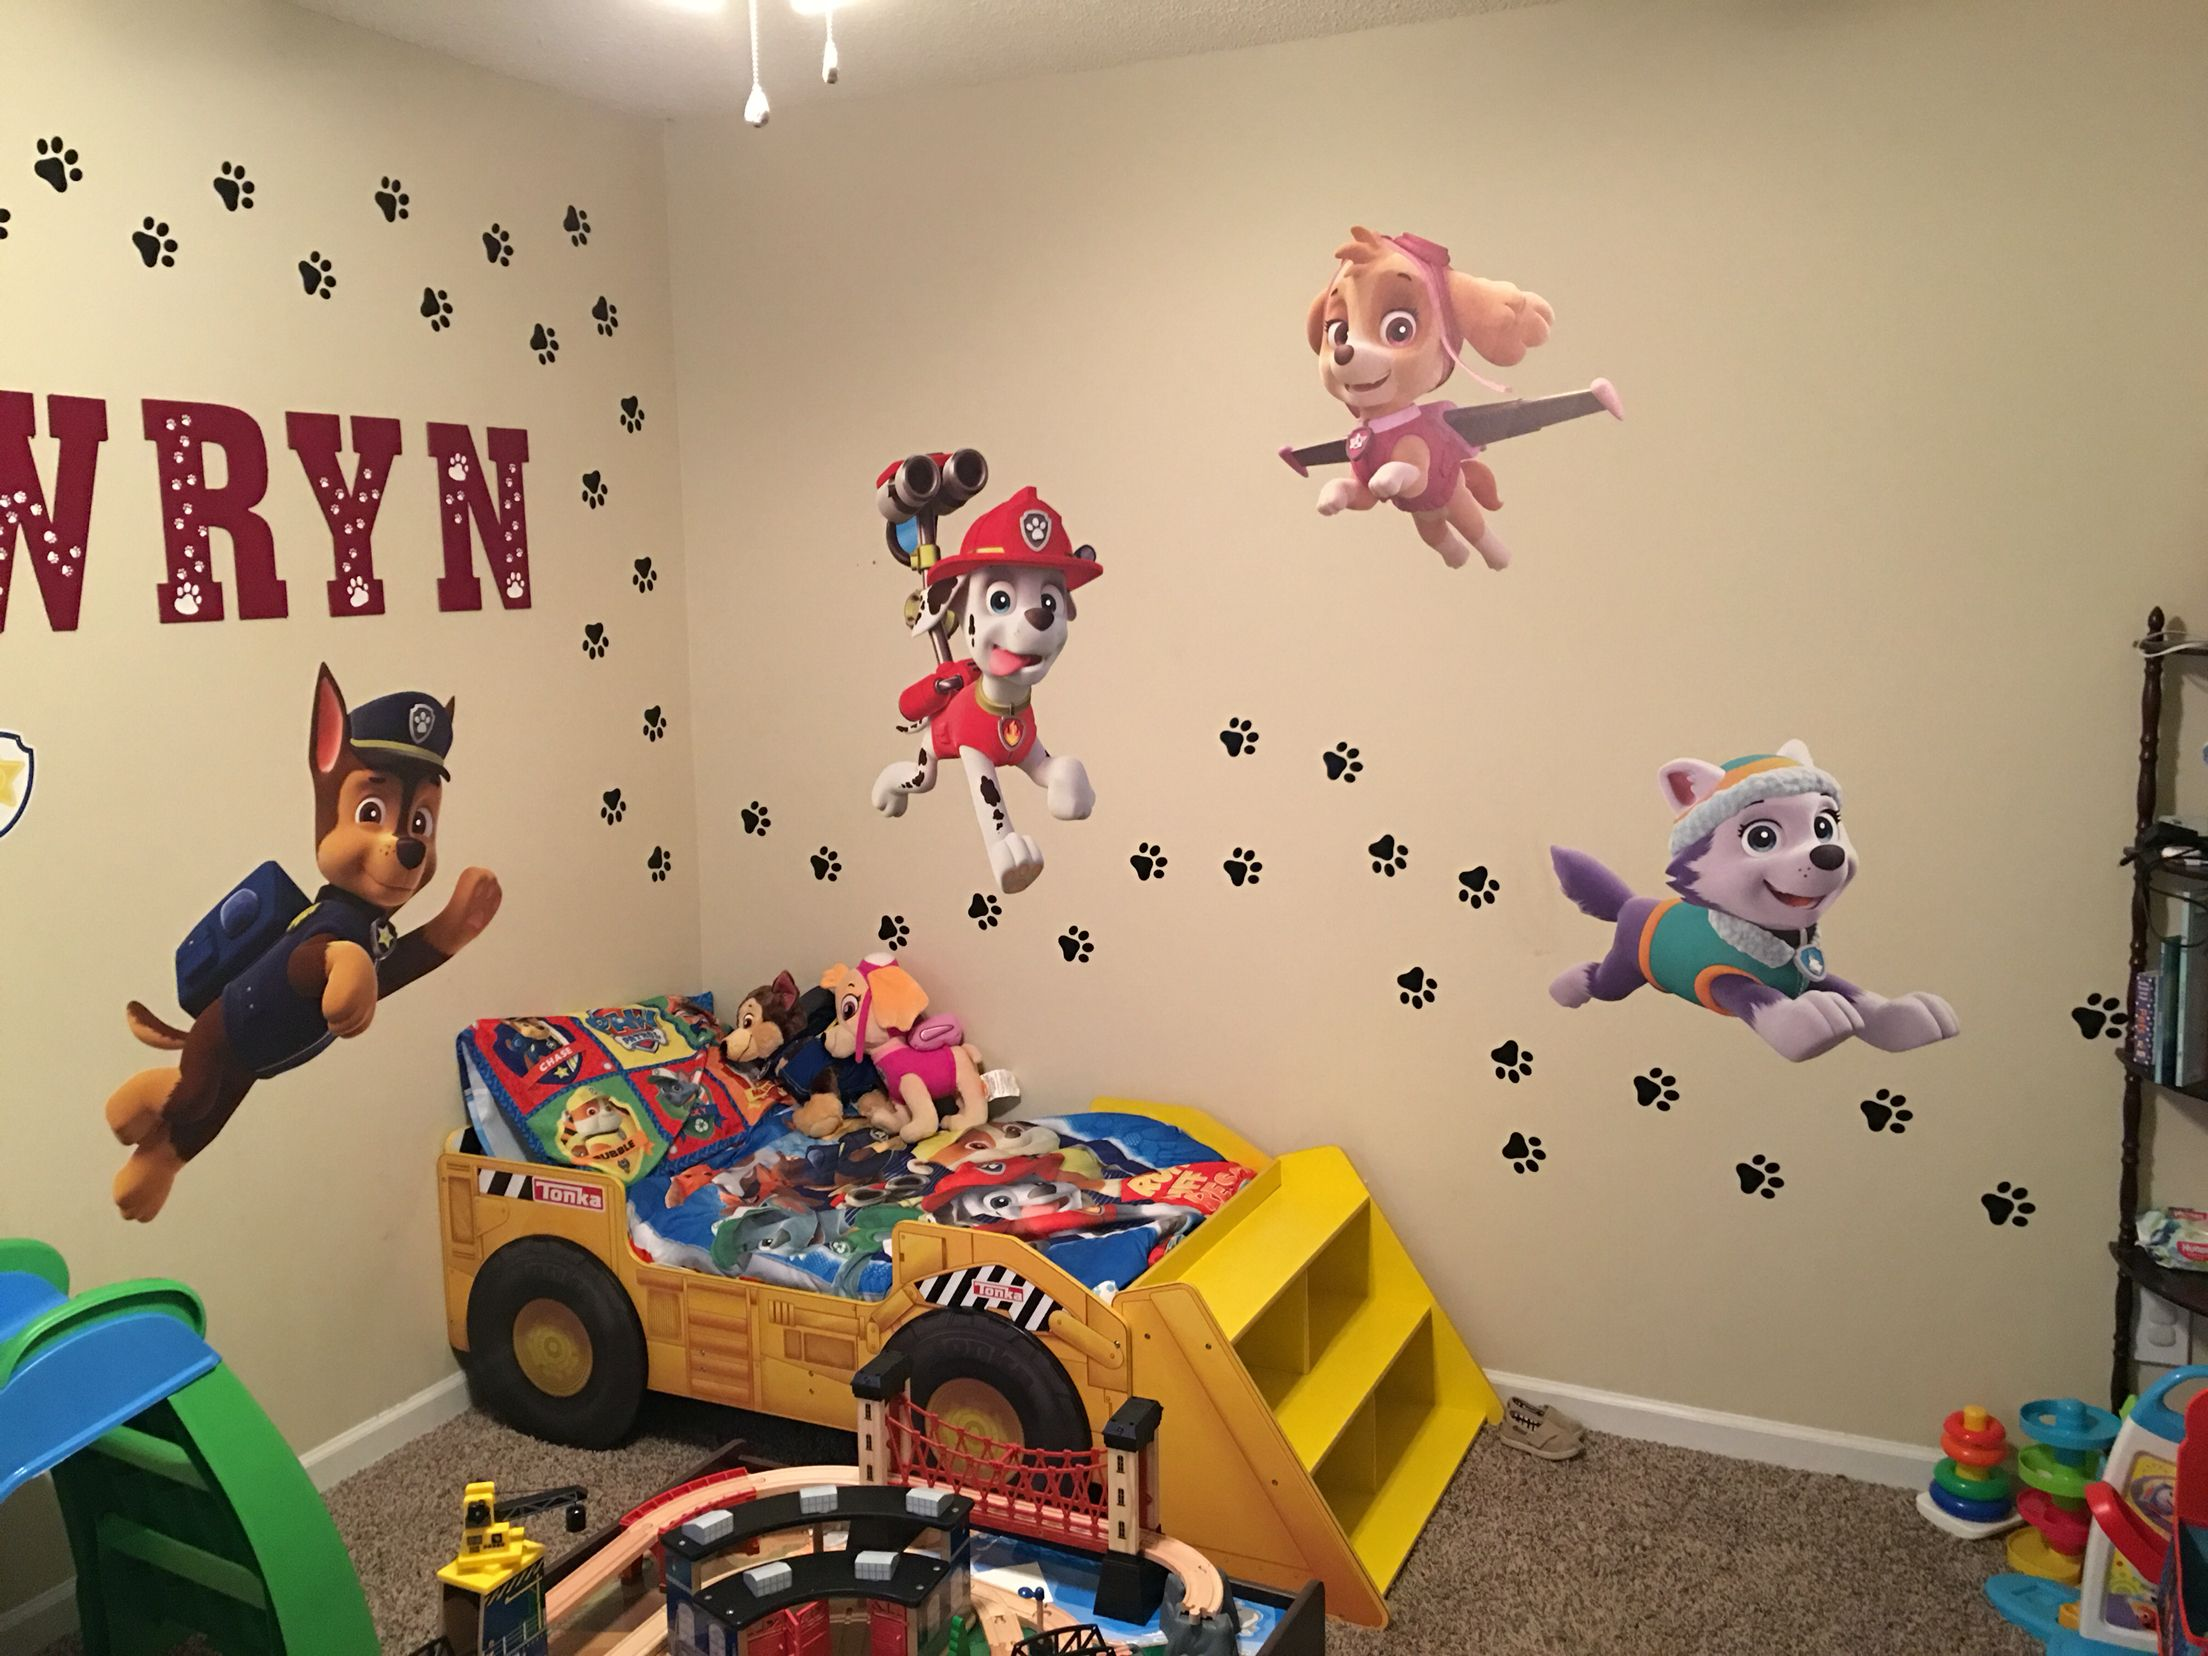 My sons paw patrol bedroom | Bday #3 Paw Patrol ...